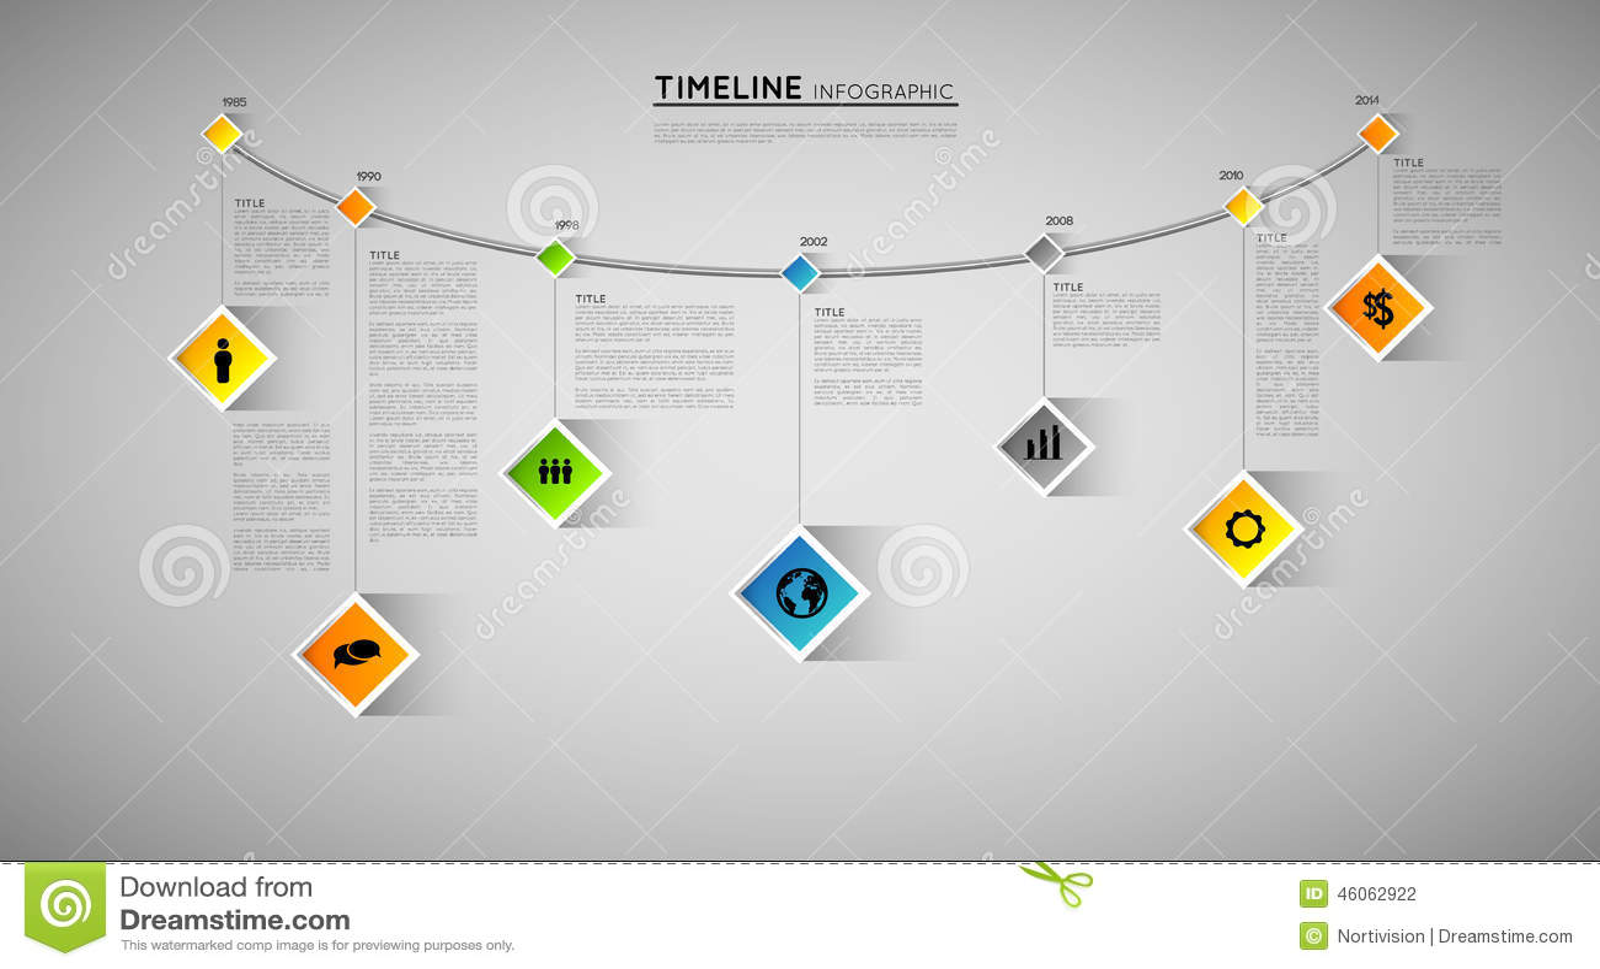 Production Timeline Template - skiro-pk-i-pro.tk